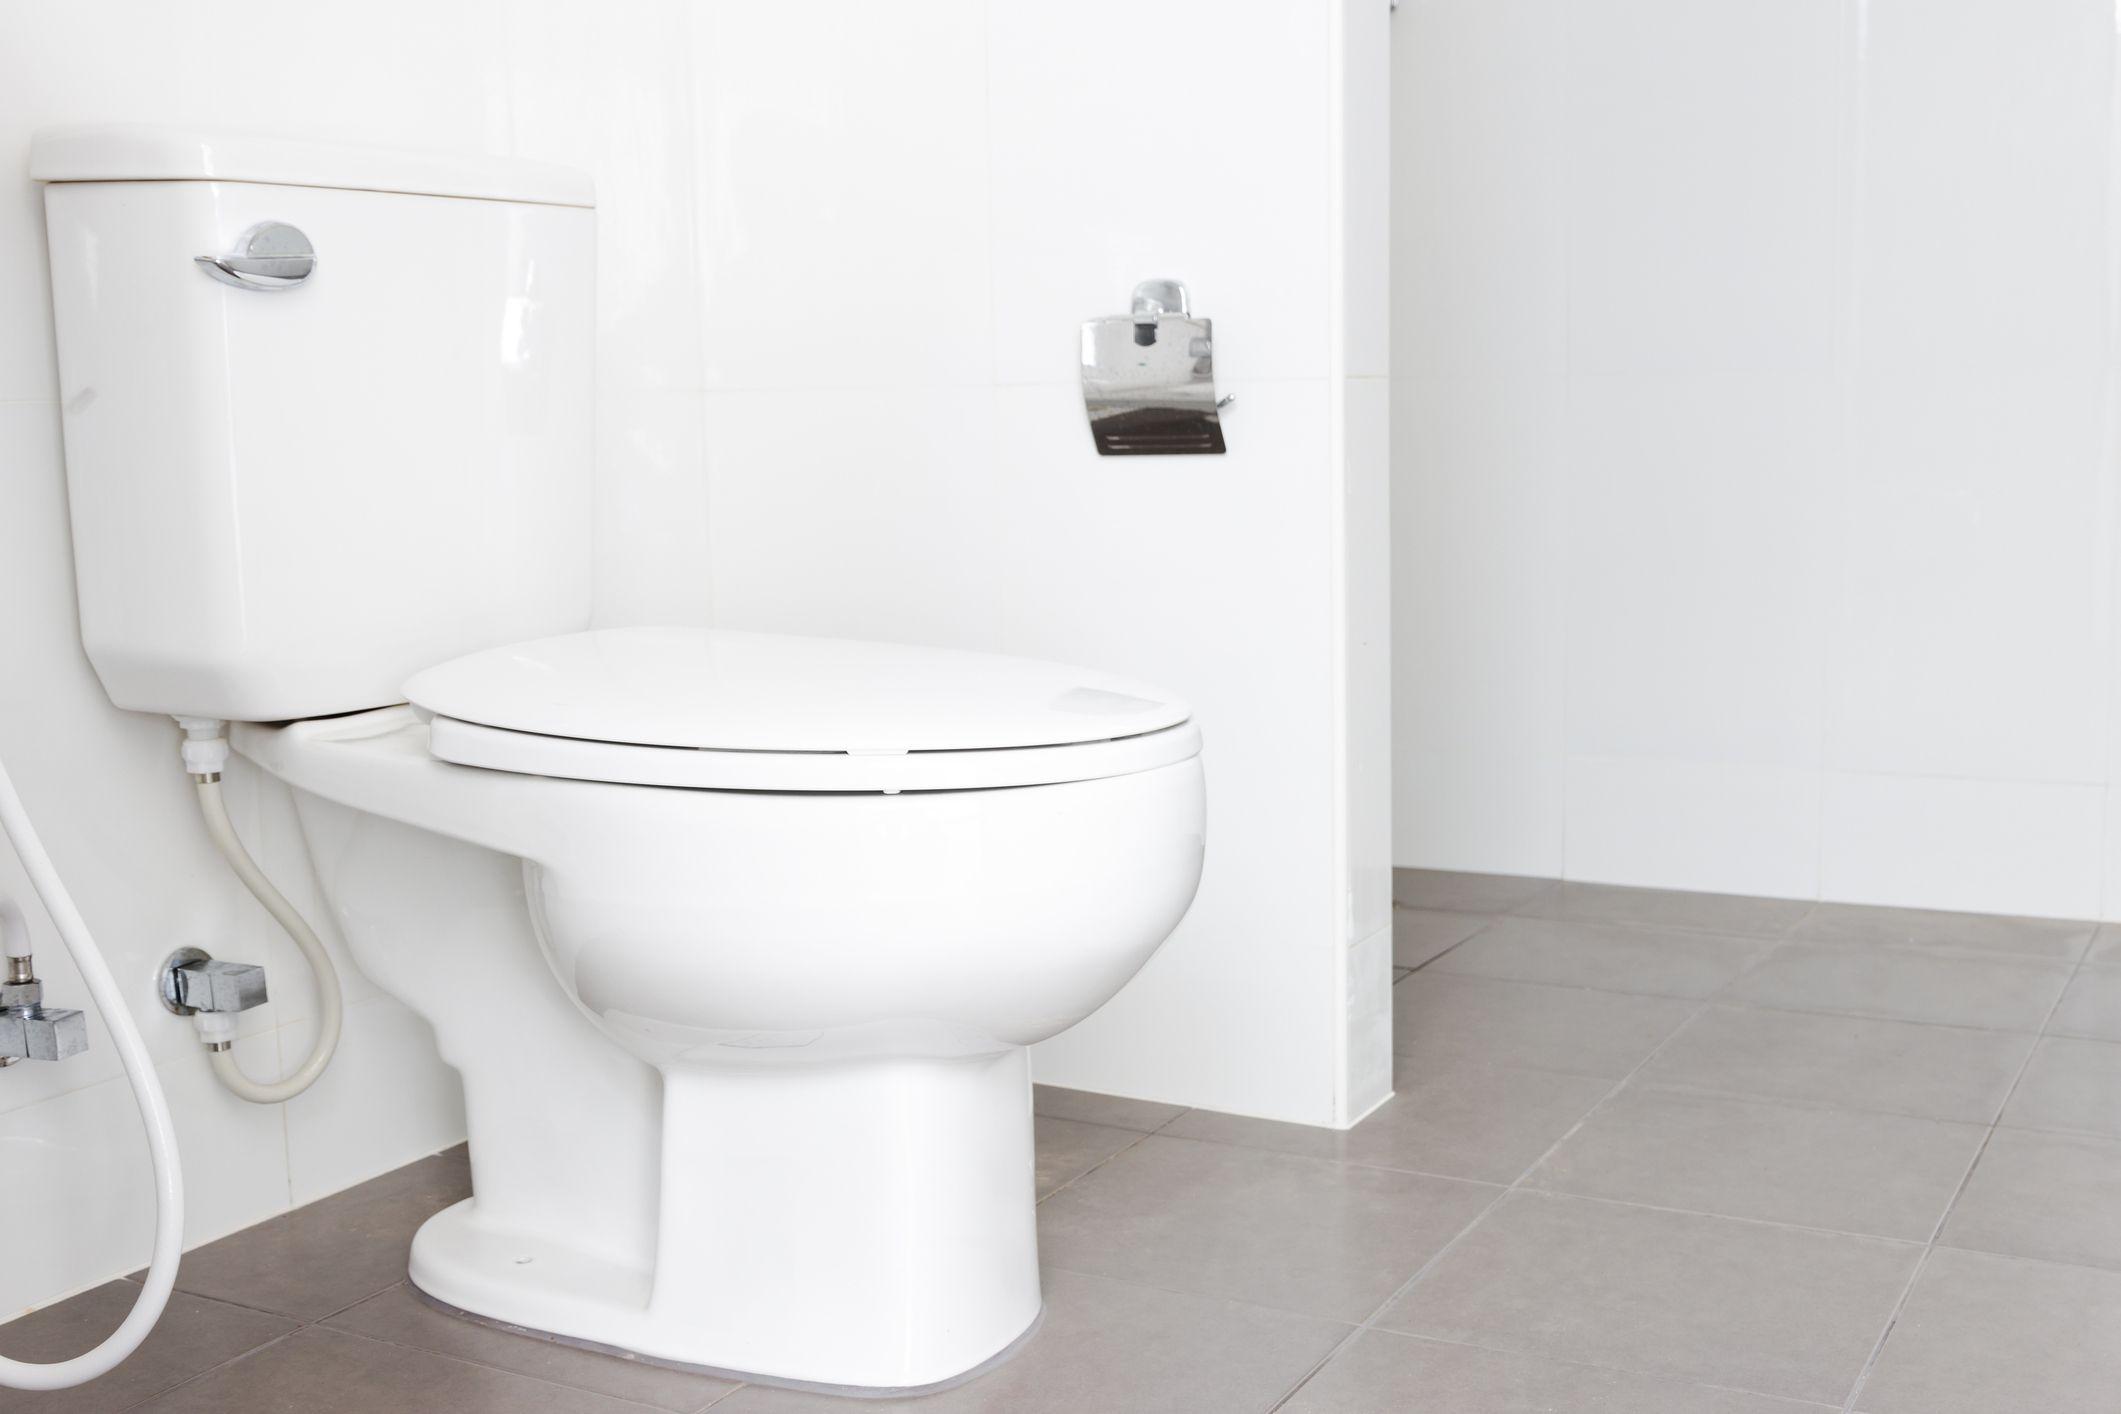 Toilet Button Broken